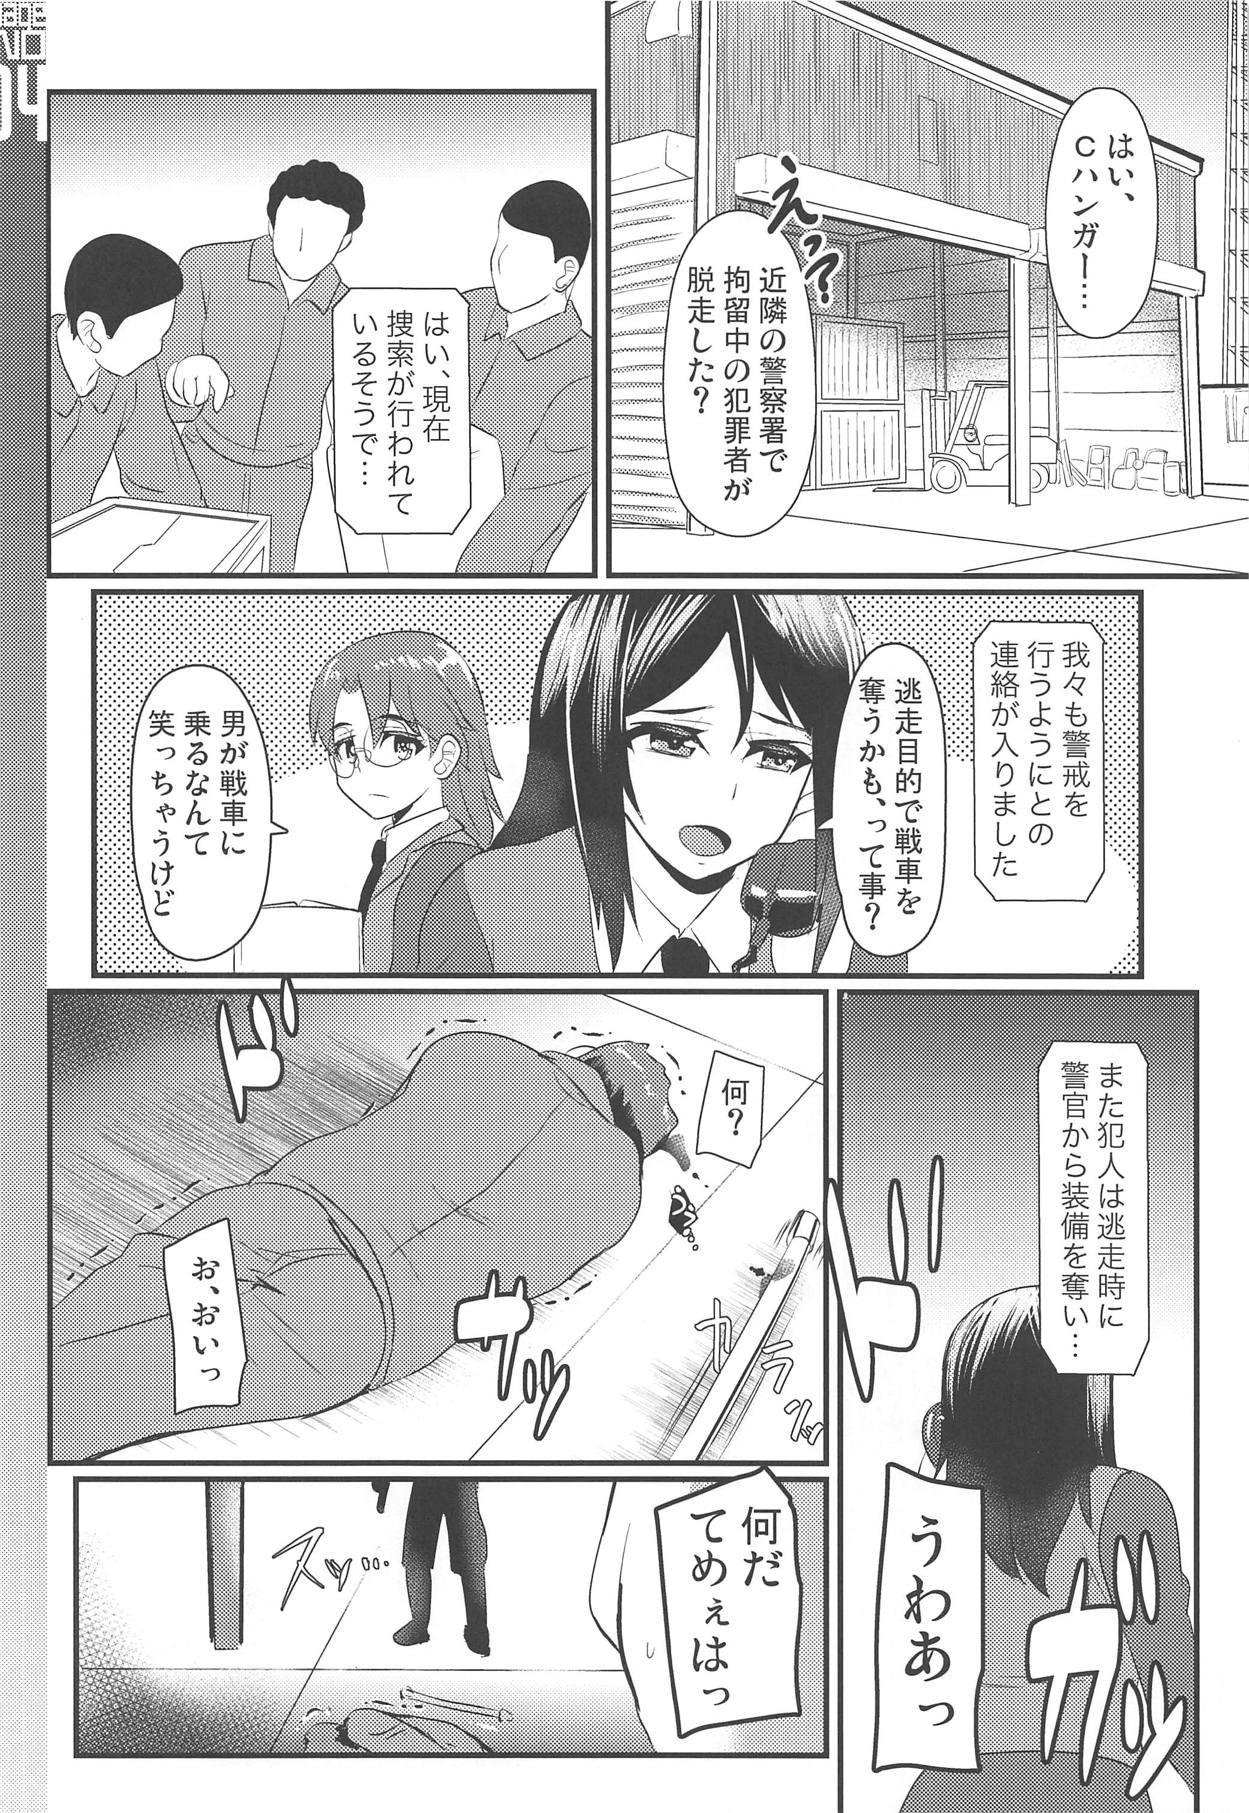 (Panzer Vor! 18) [Trample Rigger (Yequo)] Zoku [Me-gata] Avenger Shoushitsu Jiken (Girls und Panzer) 2